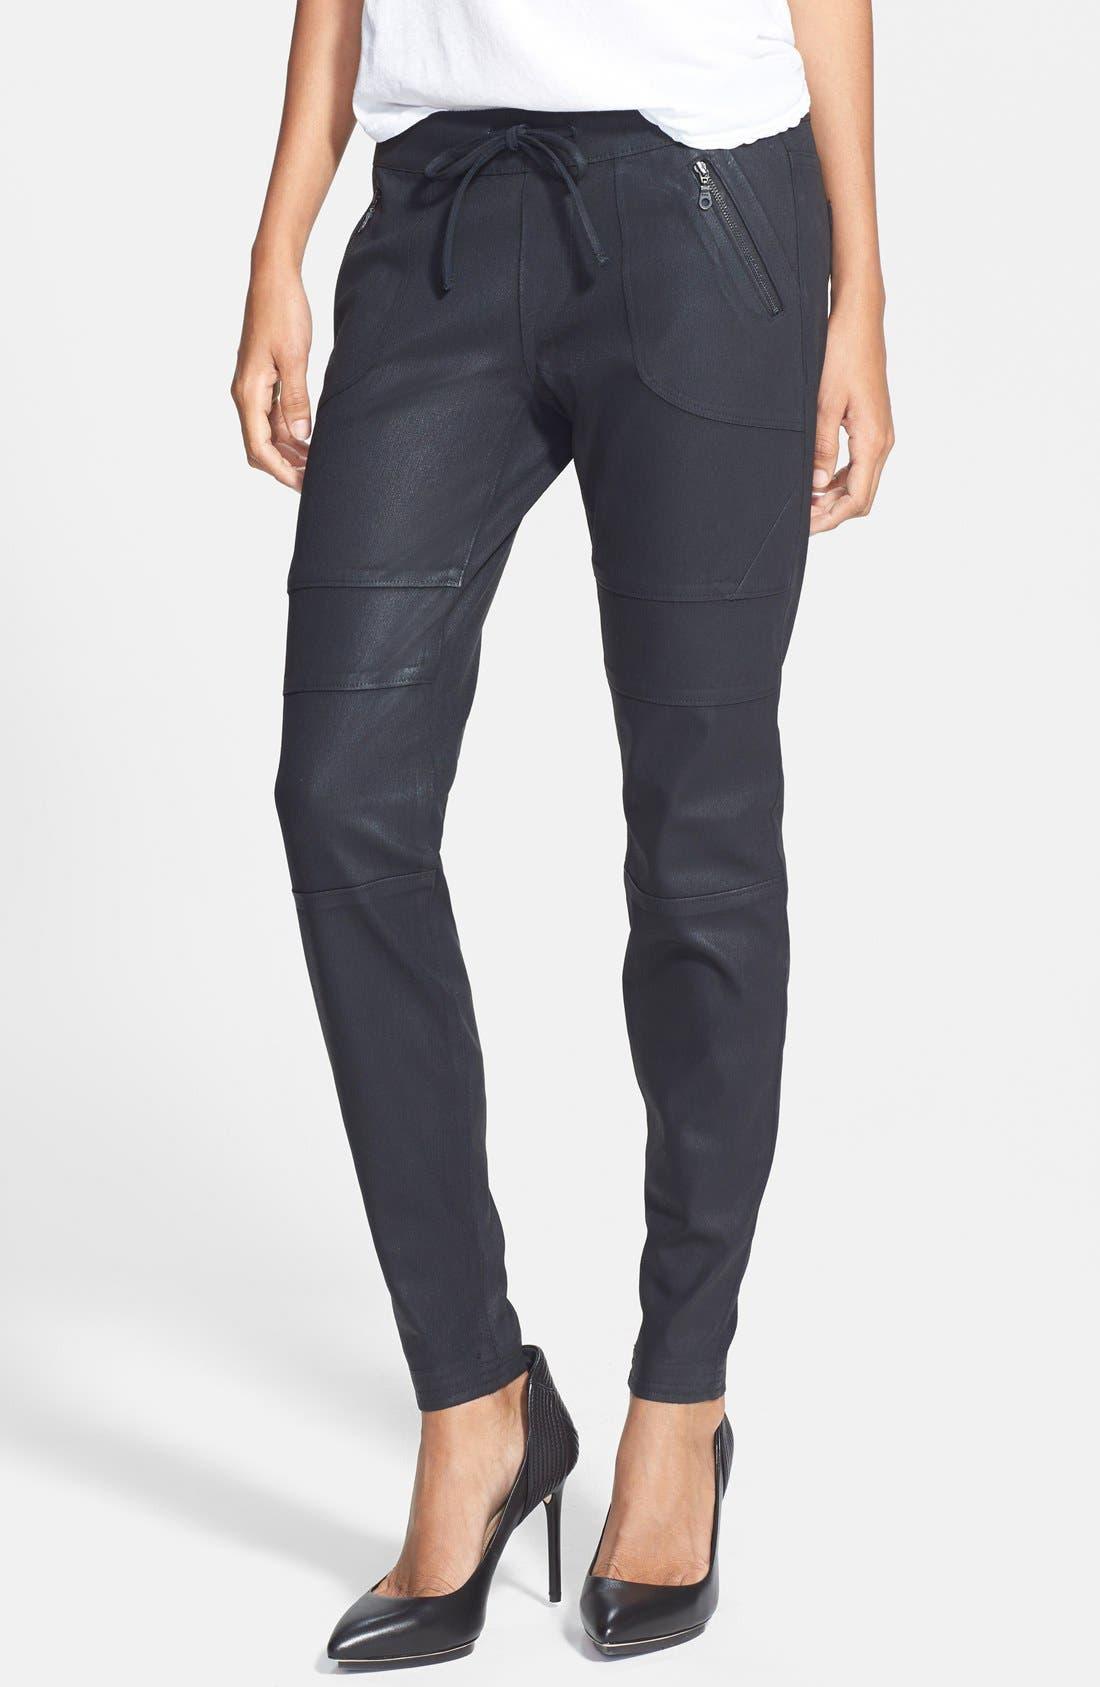 Main Image - Kiind Of Jogger Skinny Pants